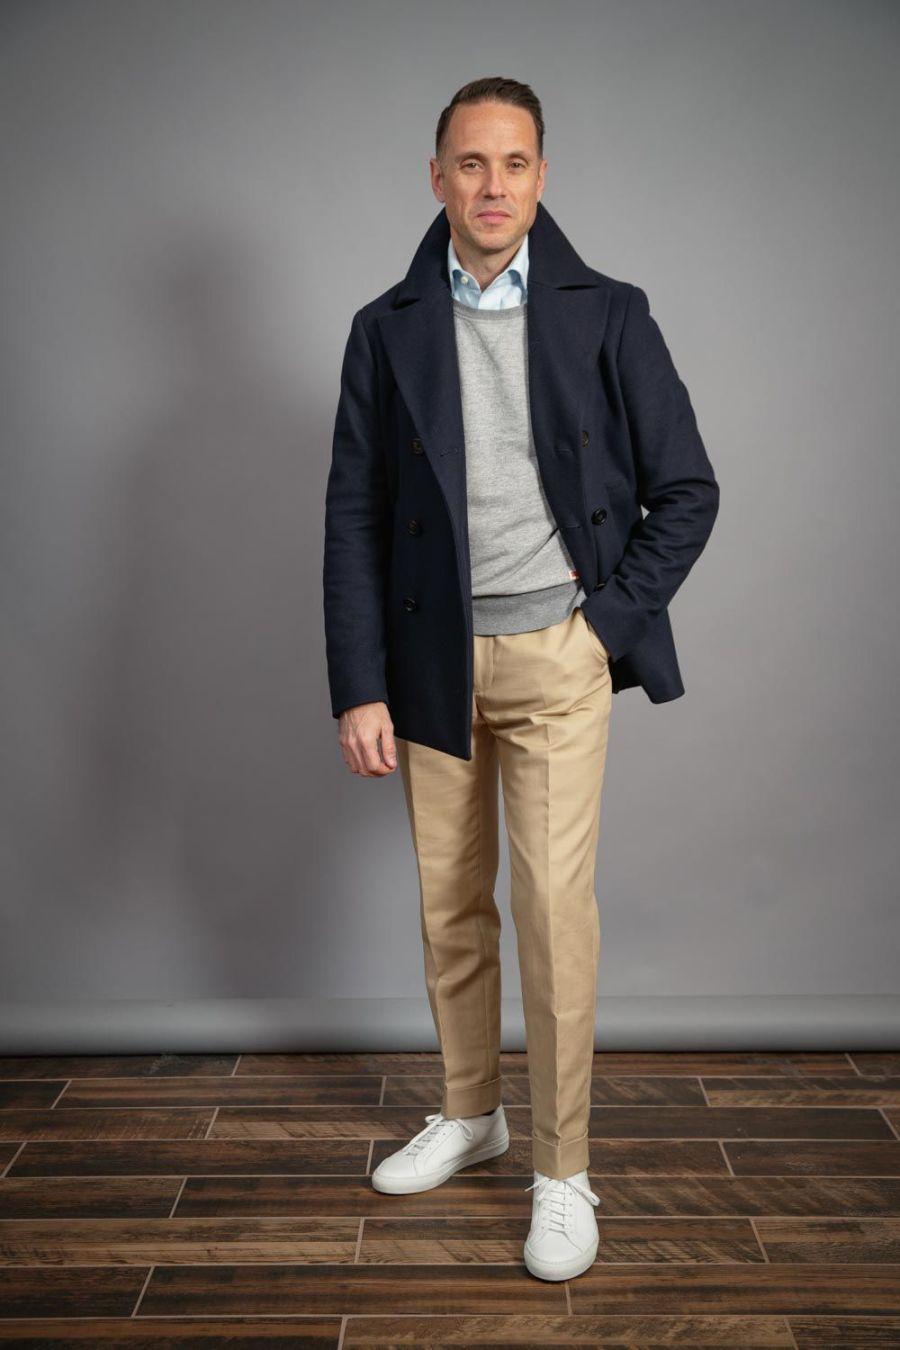 white-sneakers-khaki-chinos-navy-peacoat-grey-sweatshirt-winter-capsule-wardrobe-for-men